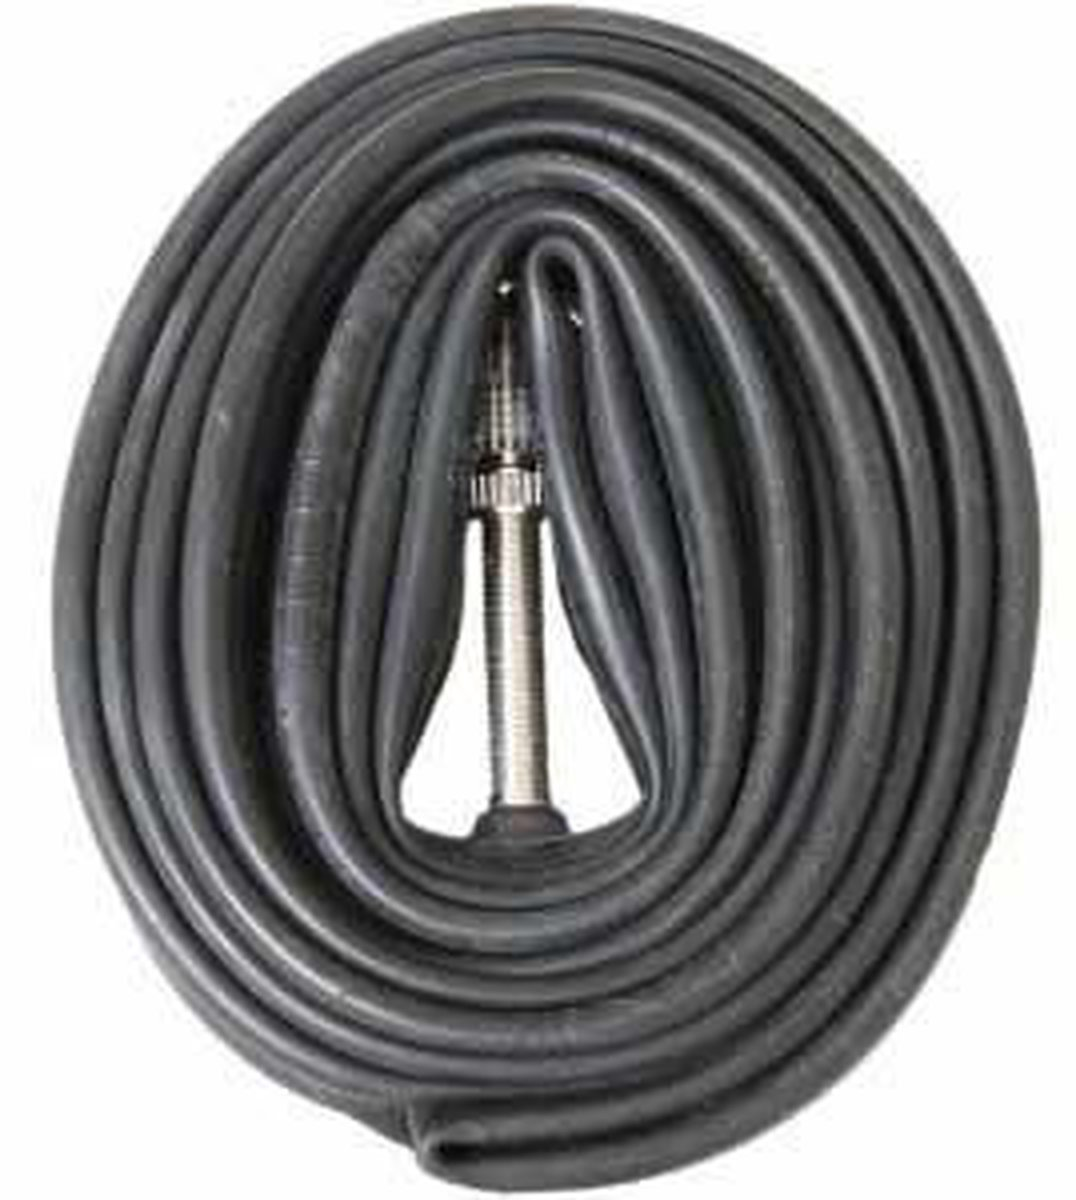 Fiets Binnenband - Dunlop Ventiel - 28X1 -  5/8X1 -  3/8 - 700x35 - 43C